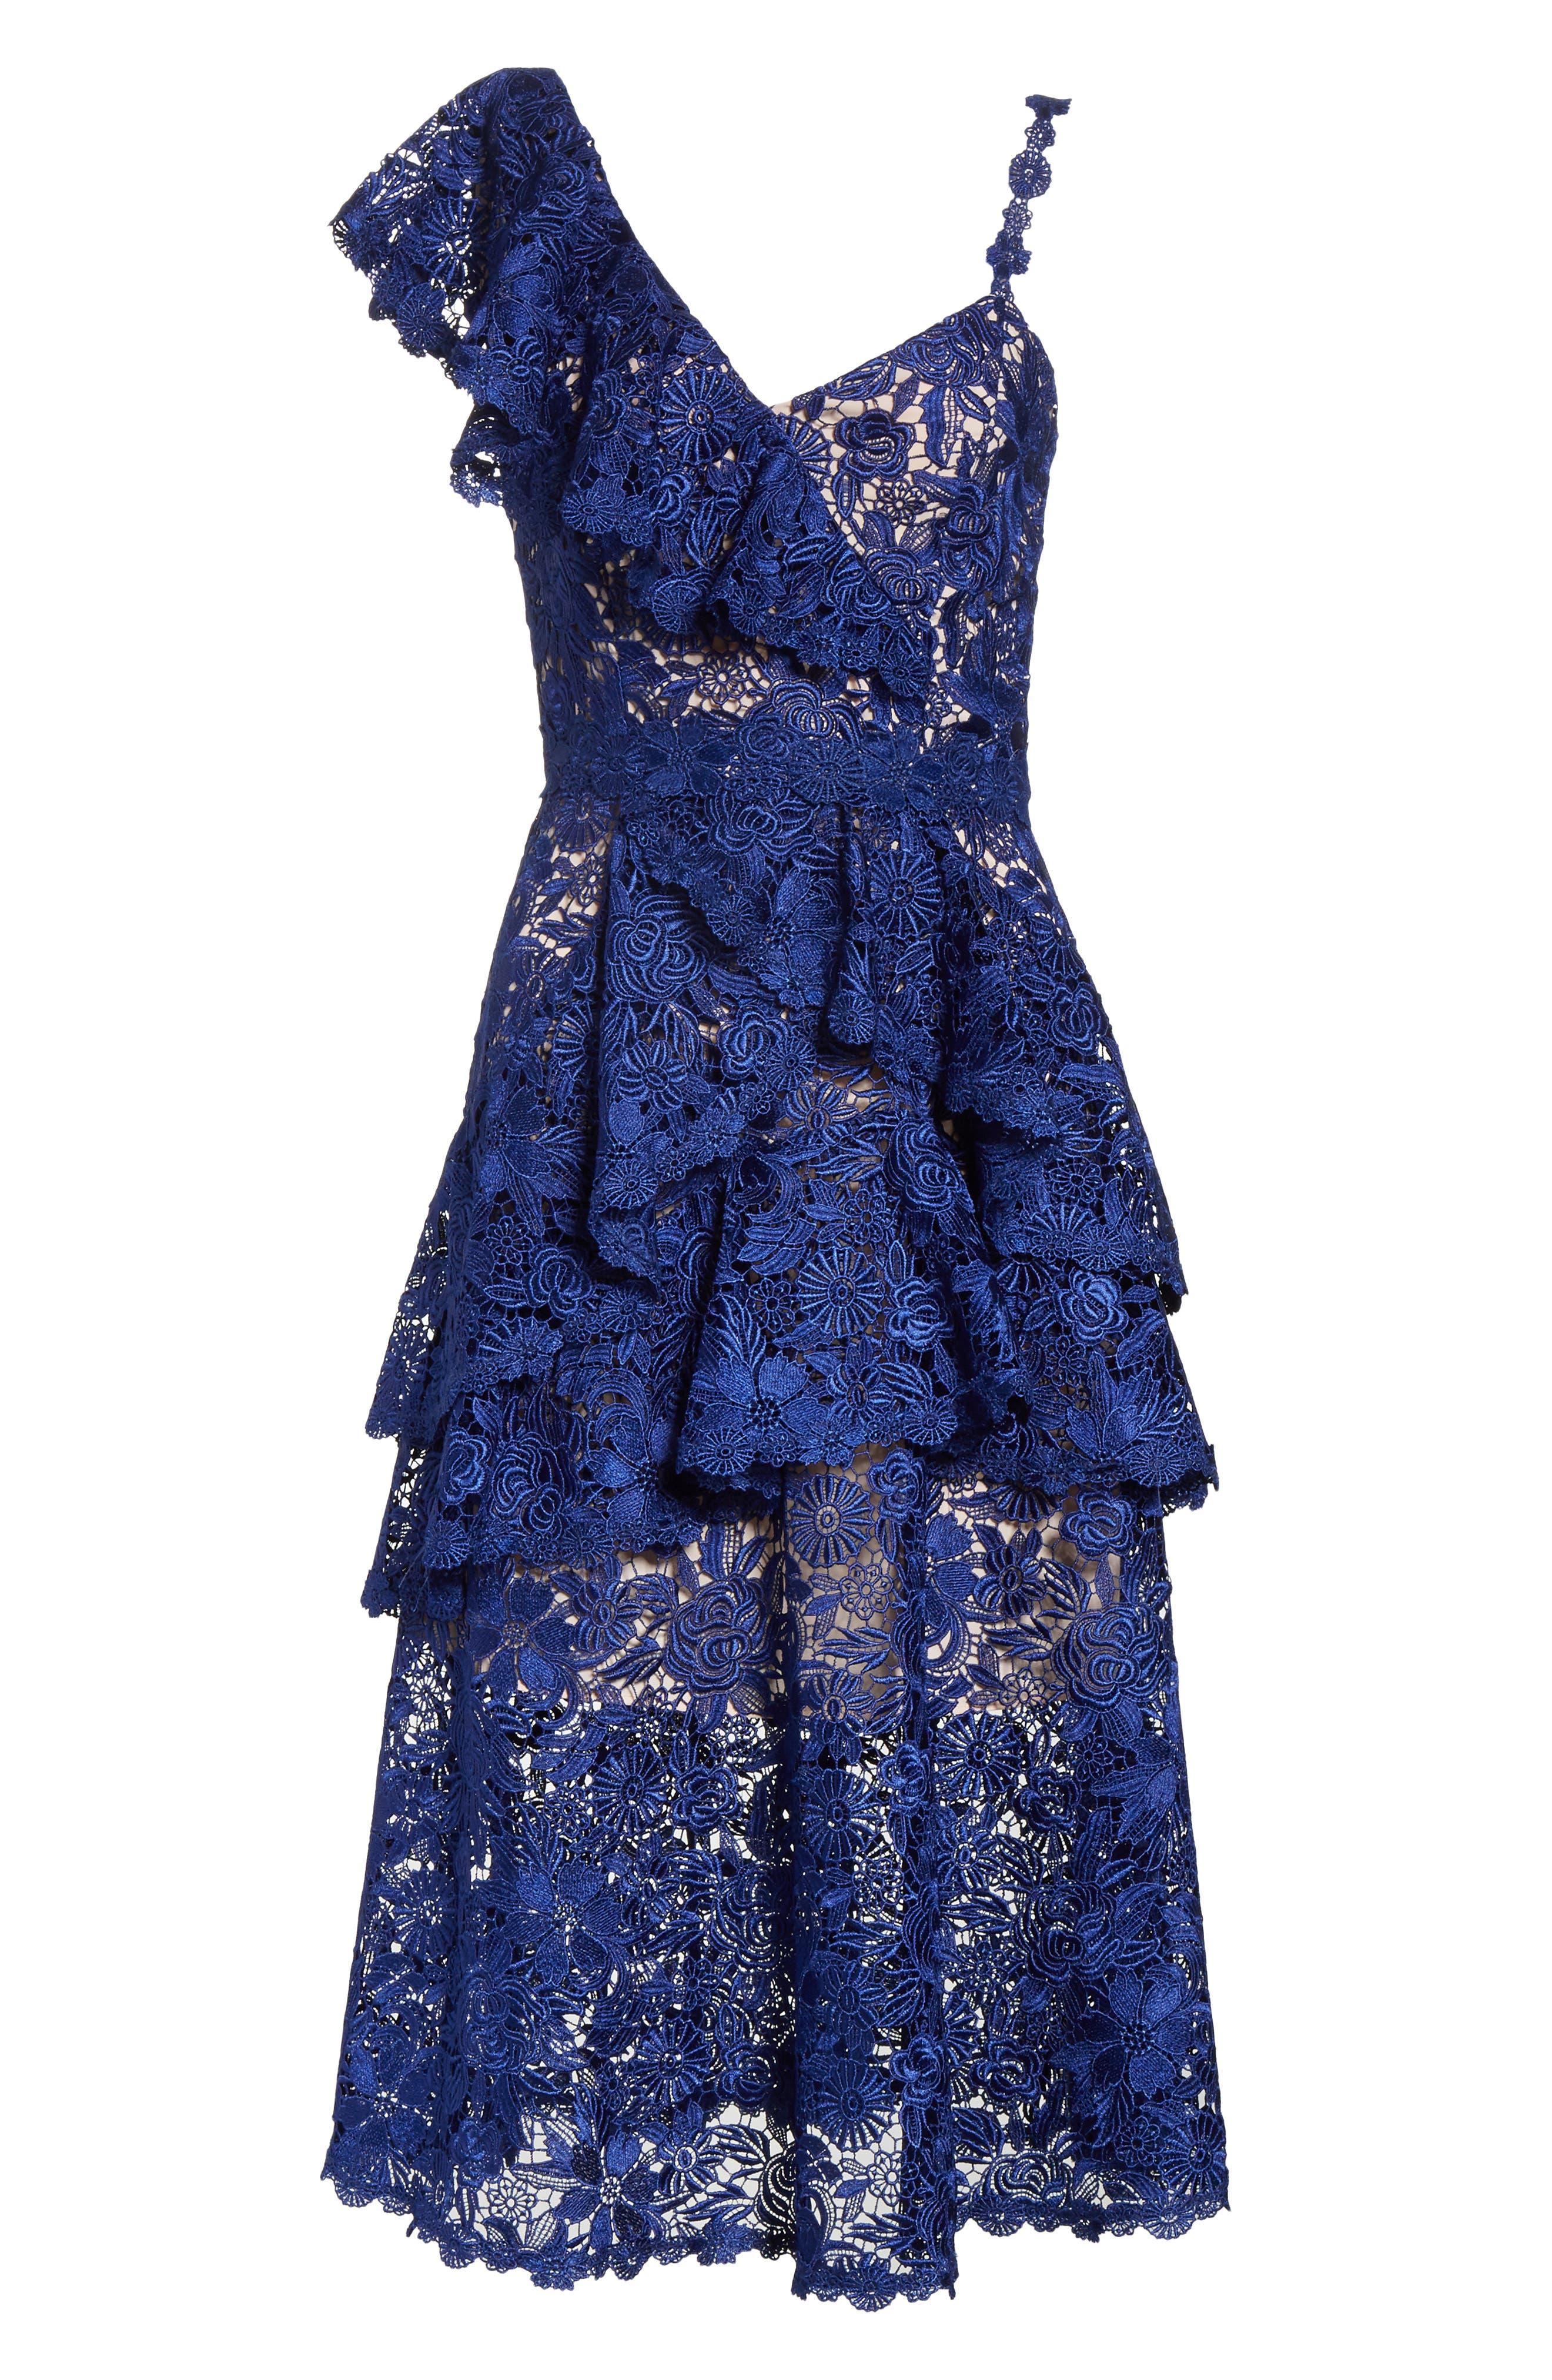 Florrie Ruffled Lace Midi Dress,                             Alternate thumbnail 6, color,                             Indigo/ Nude